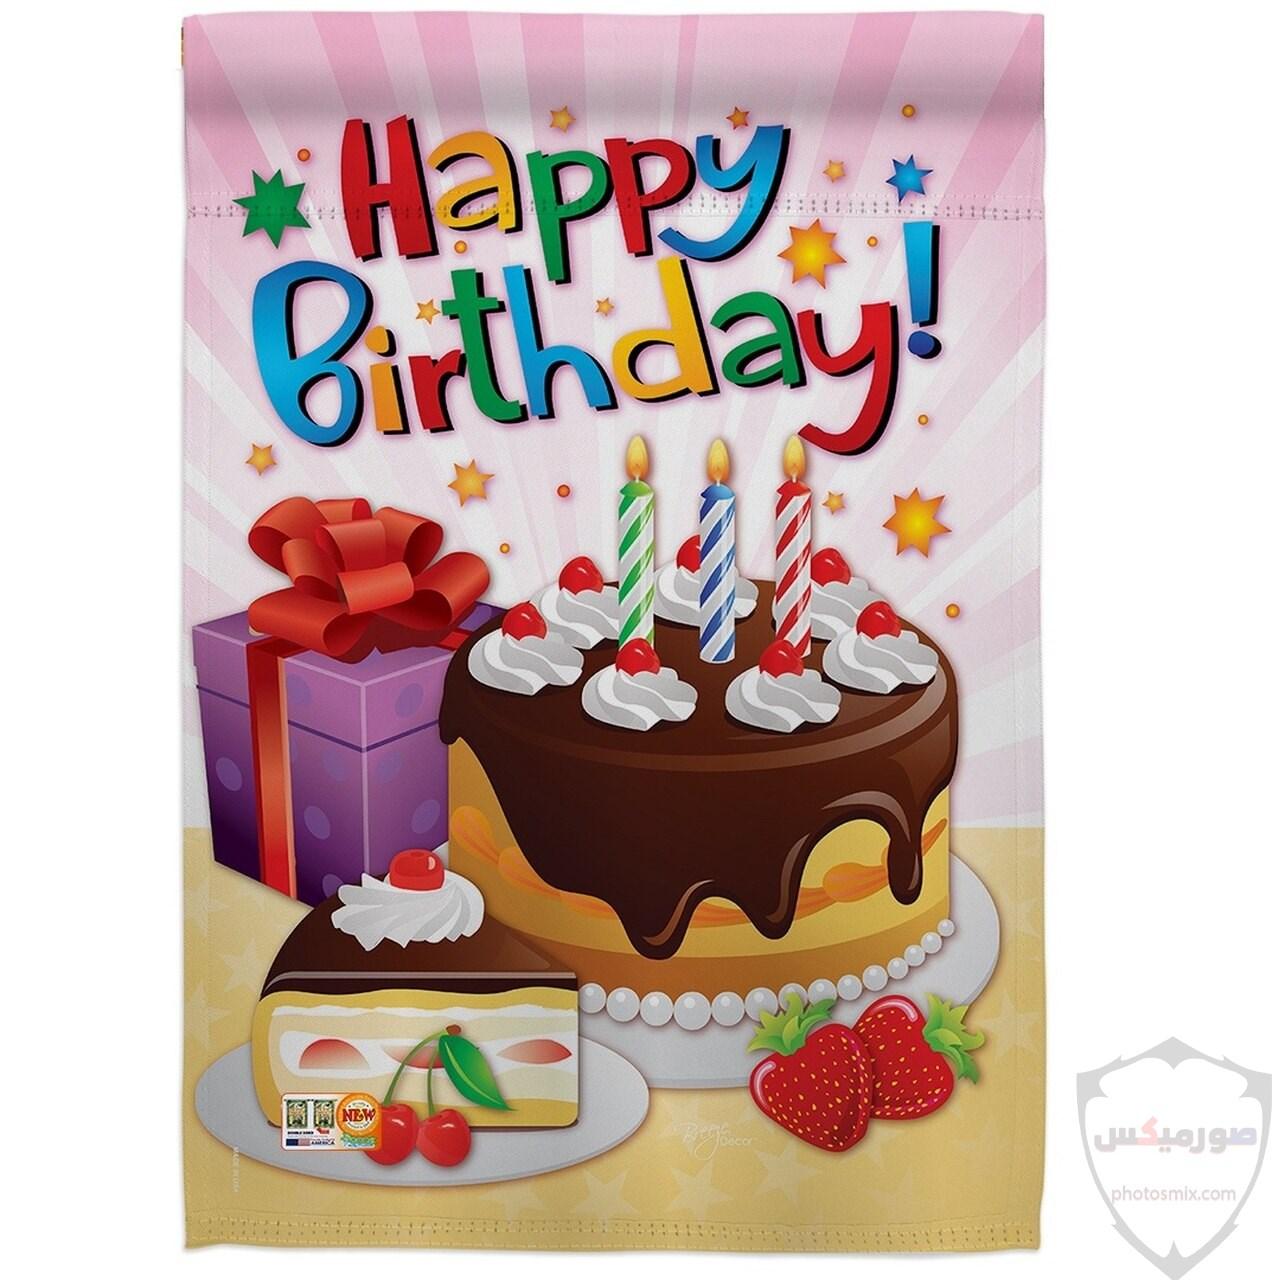 صور تورتة عيد ميلاد 2020 أجمل بطاقات صور تورت 5